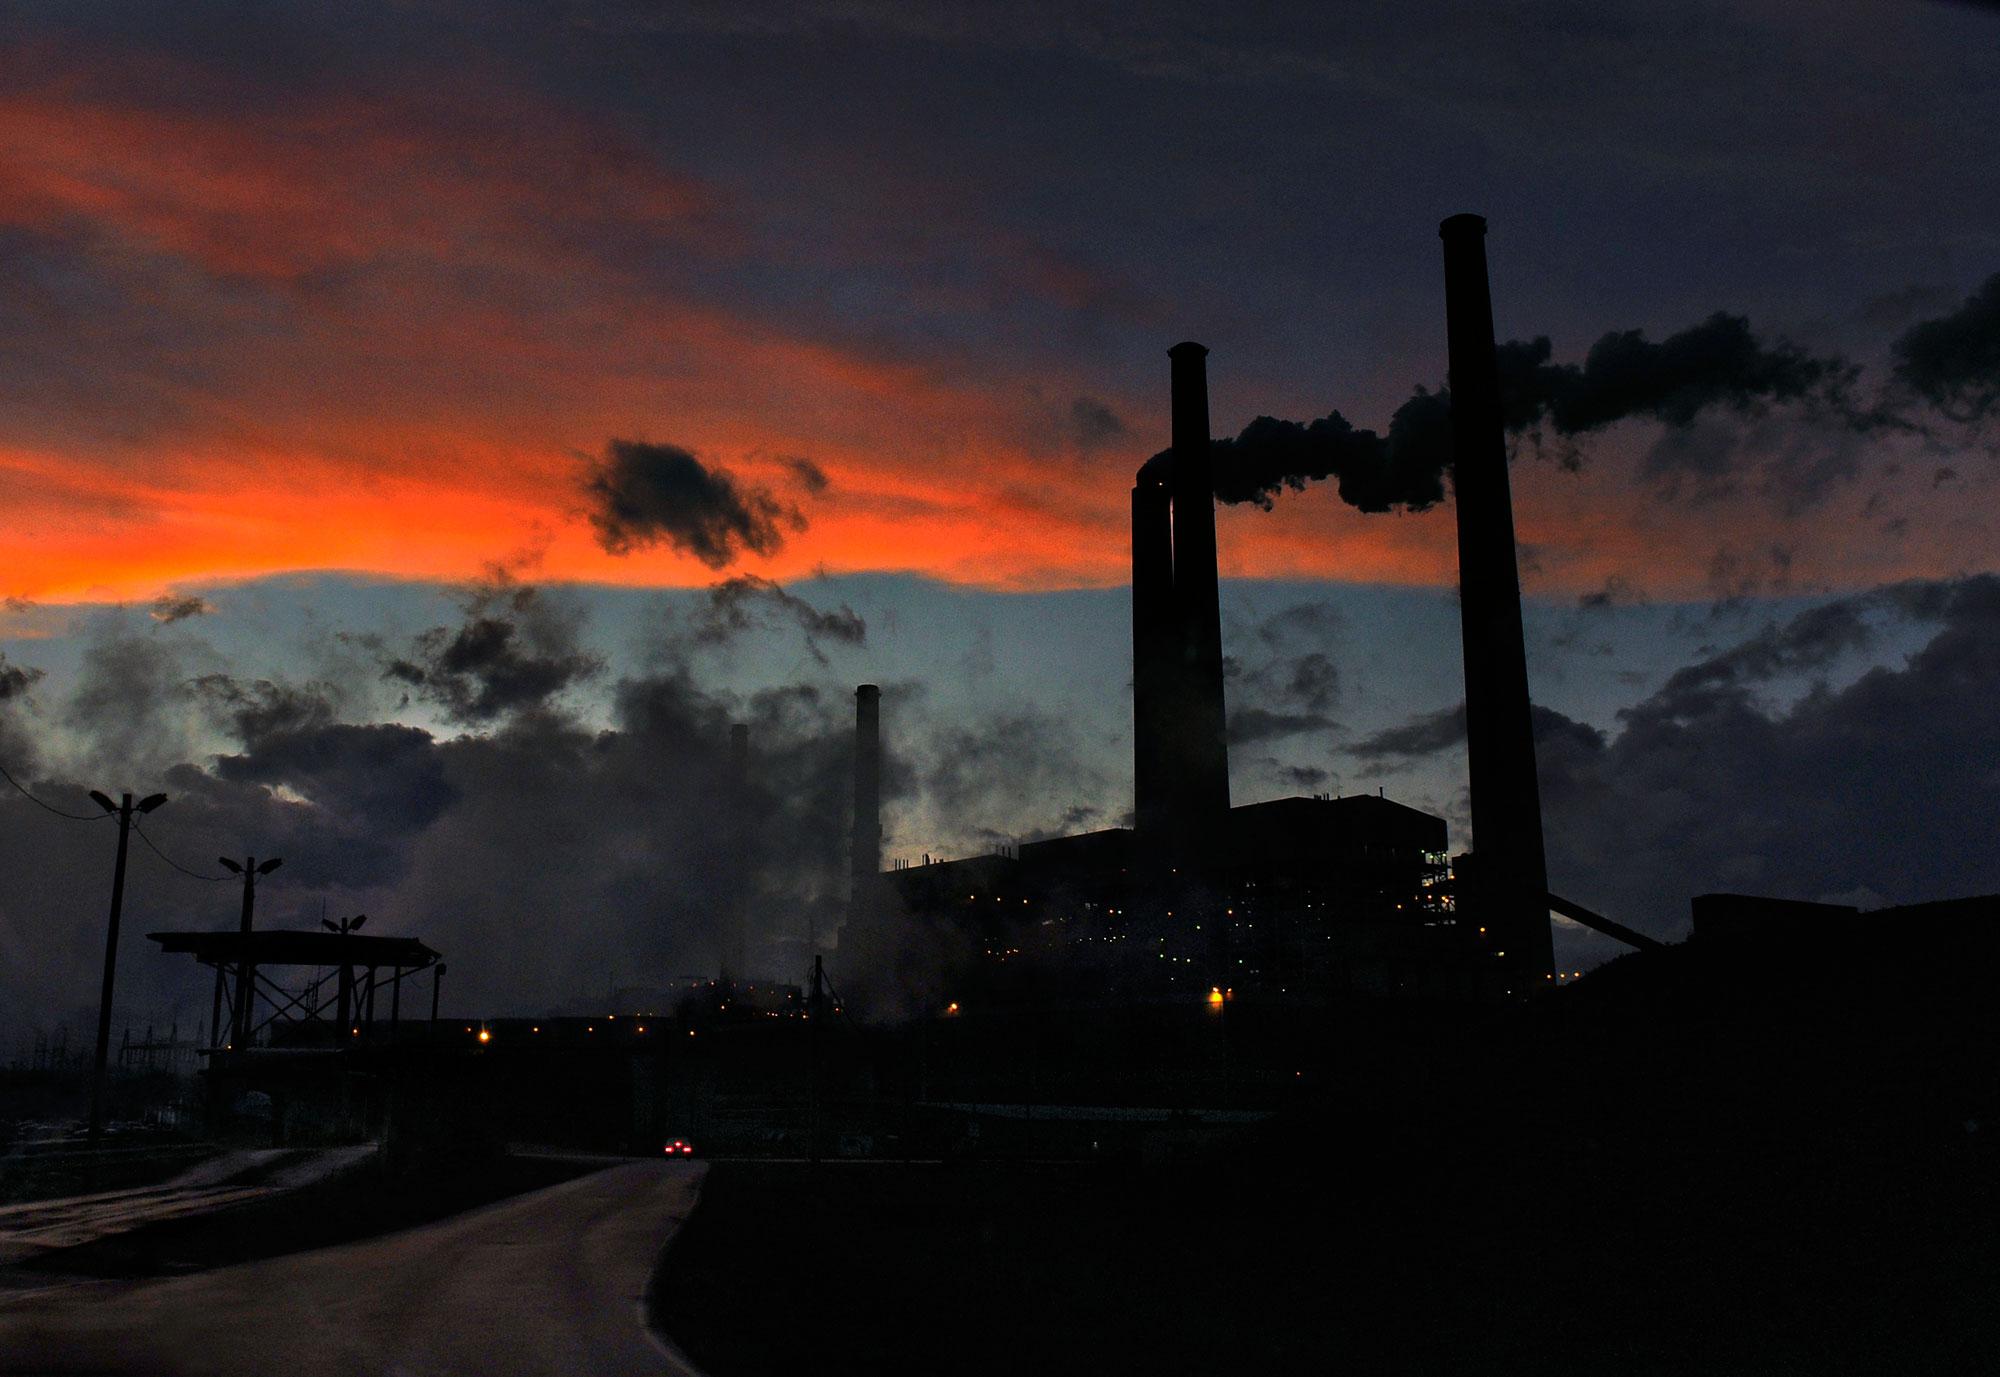 Clean Air Regulations Impact Coal Burning Plants